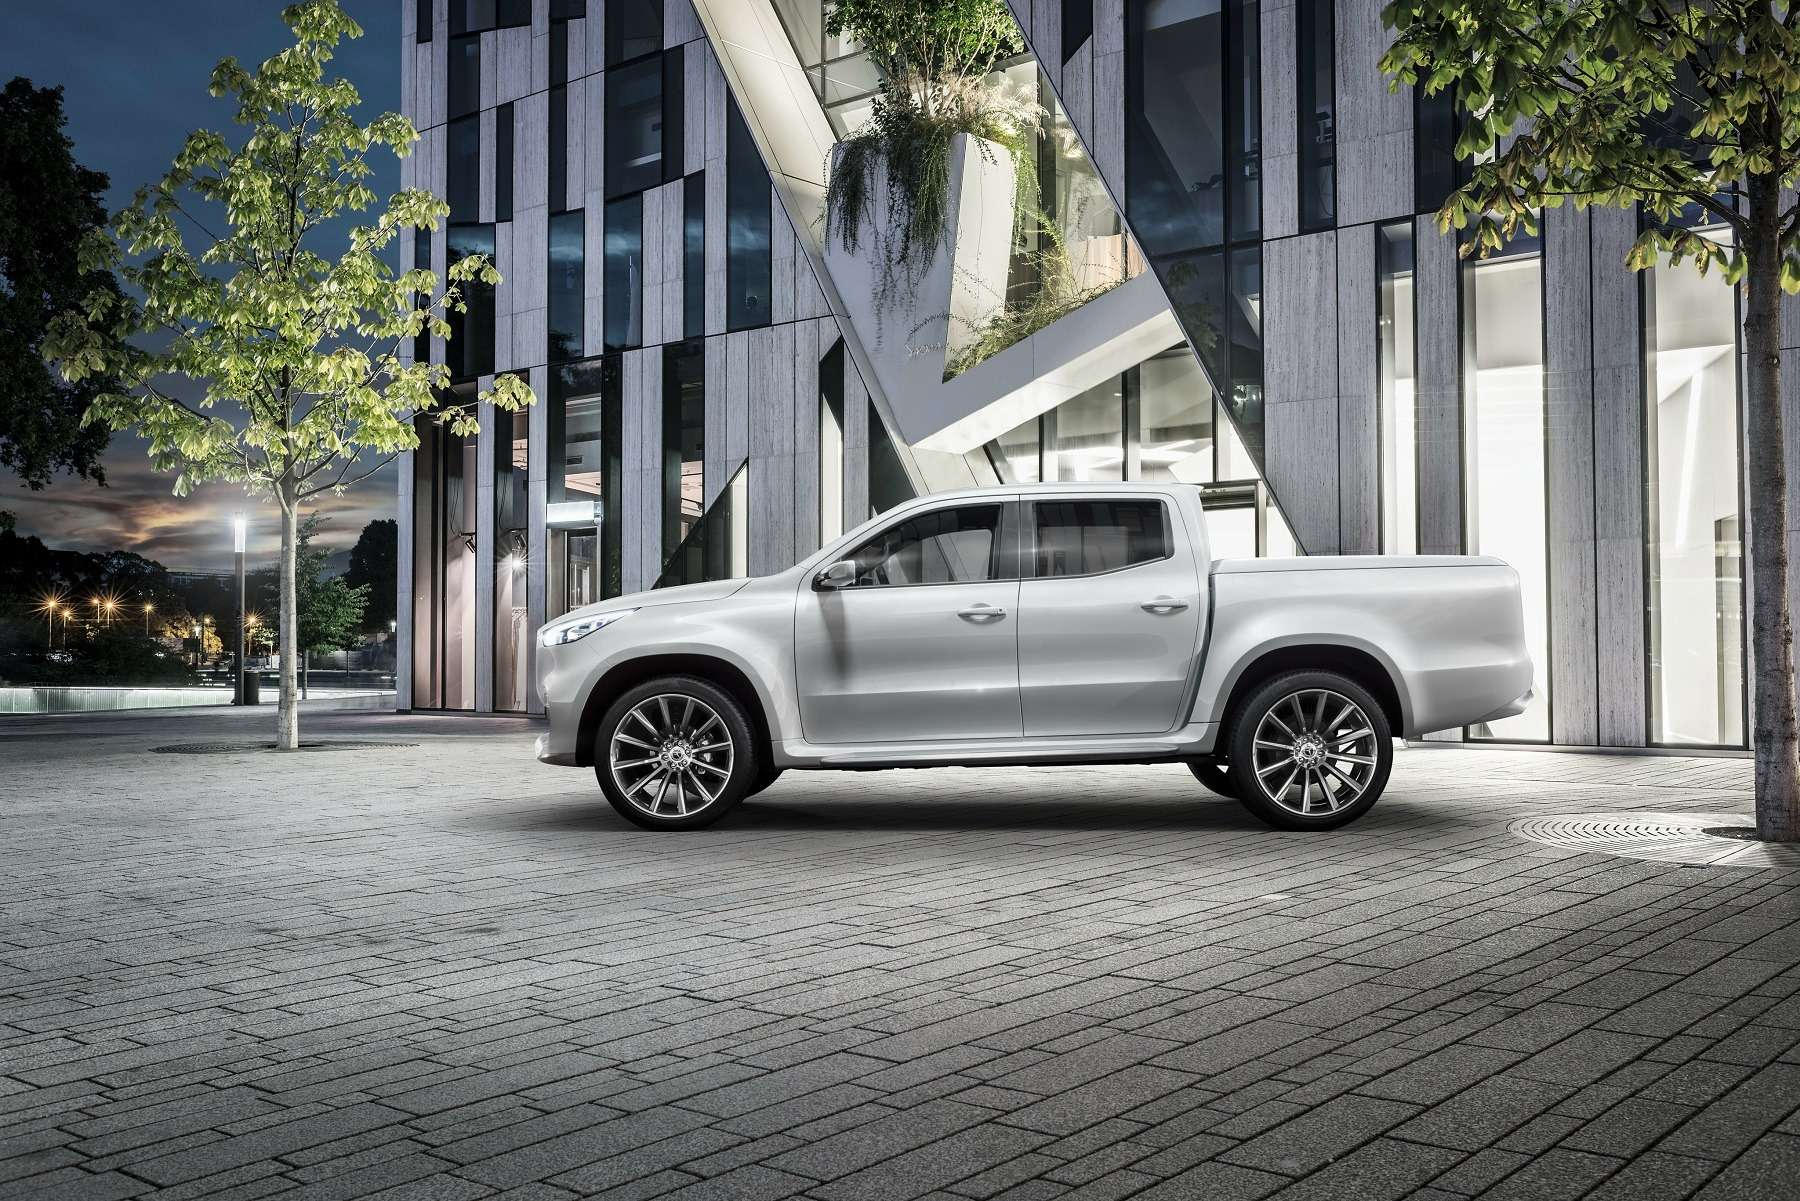 Дело чести: Mercedes-Benz представил пикапы X-класса— фото 654284